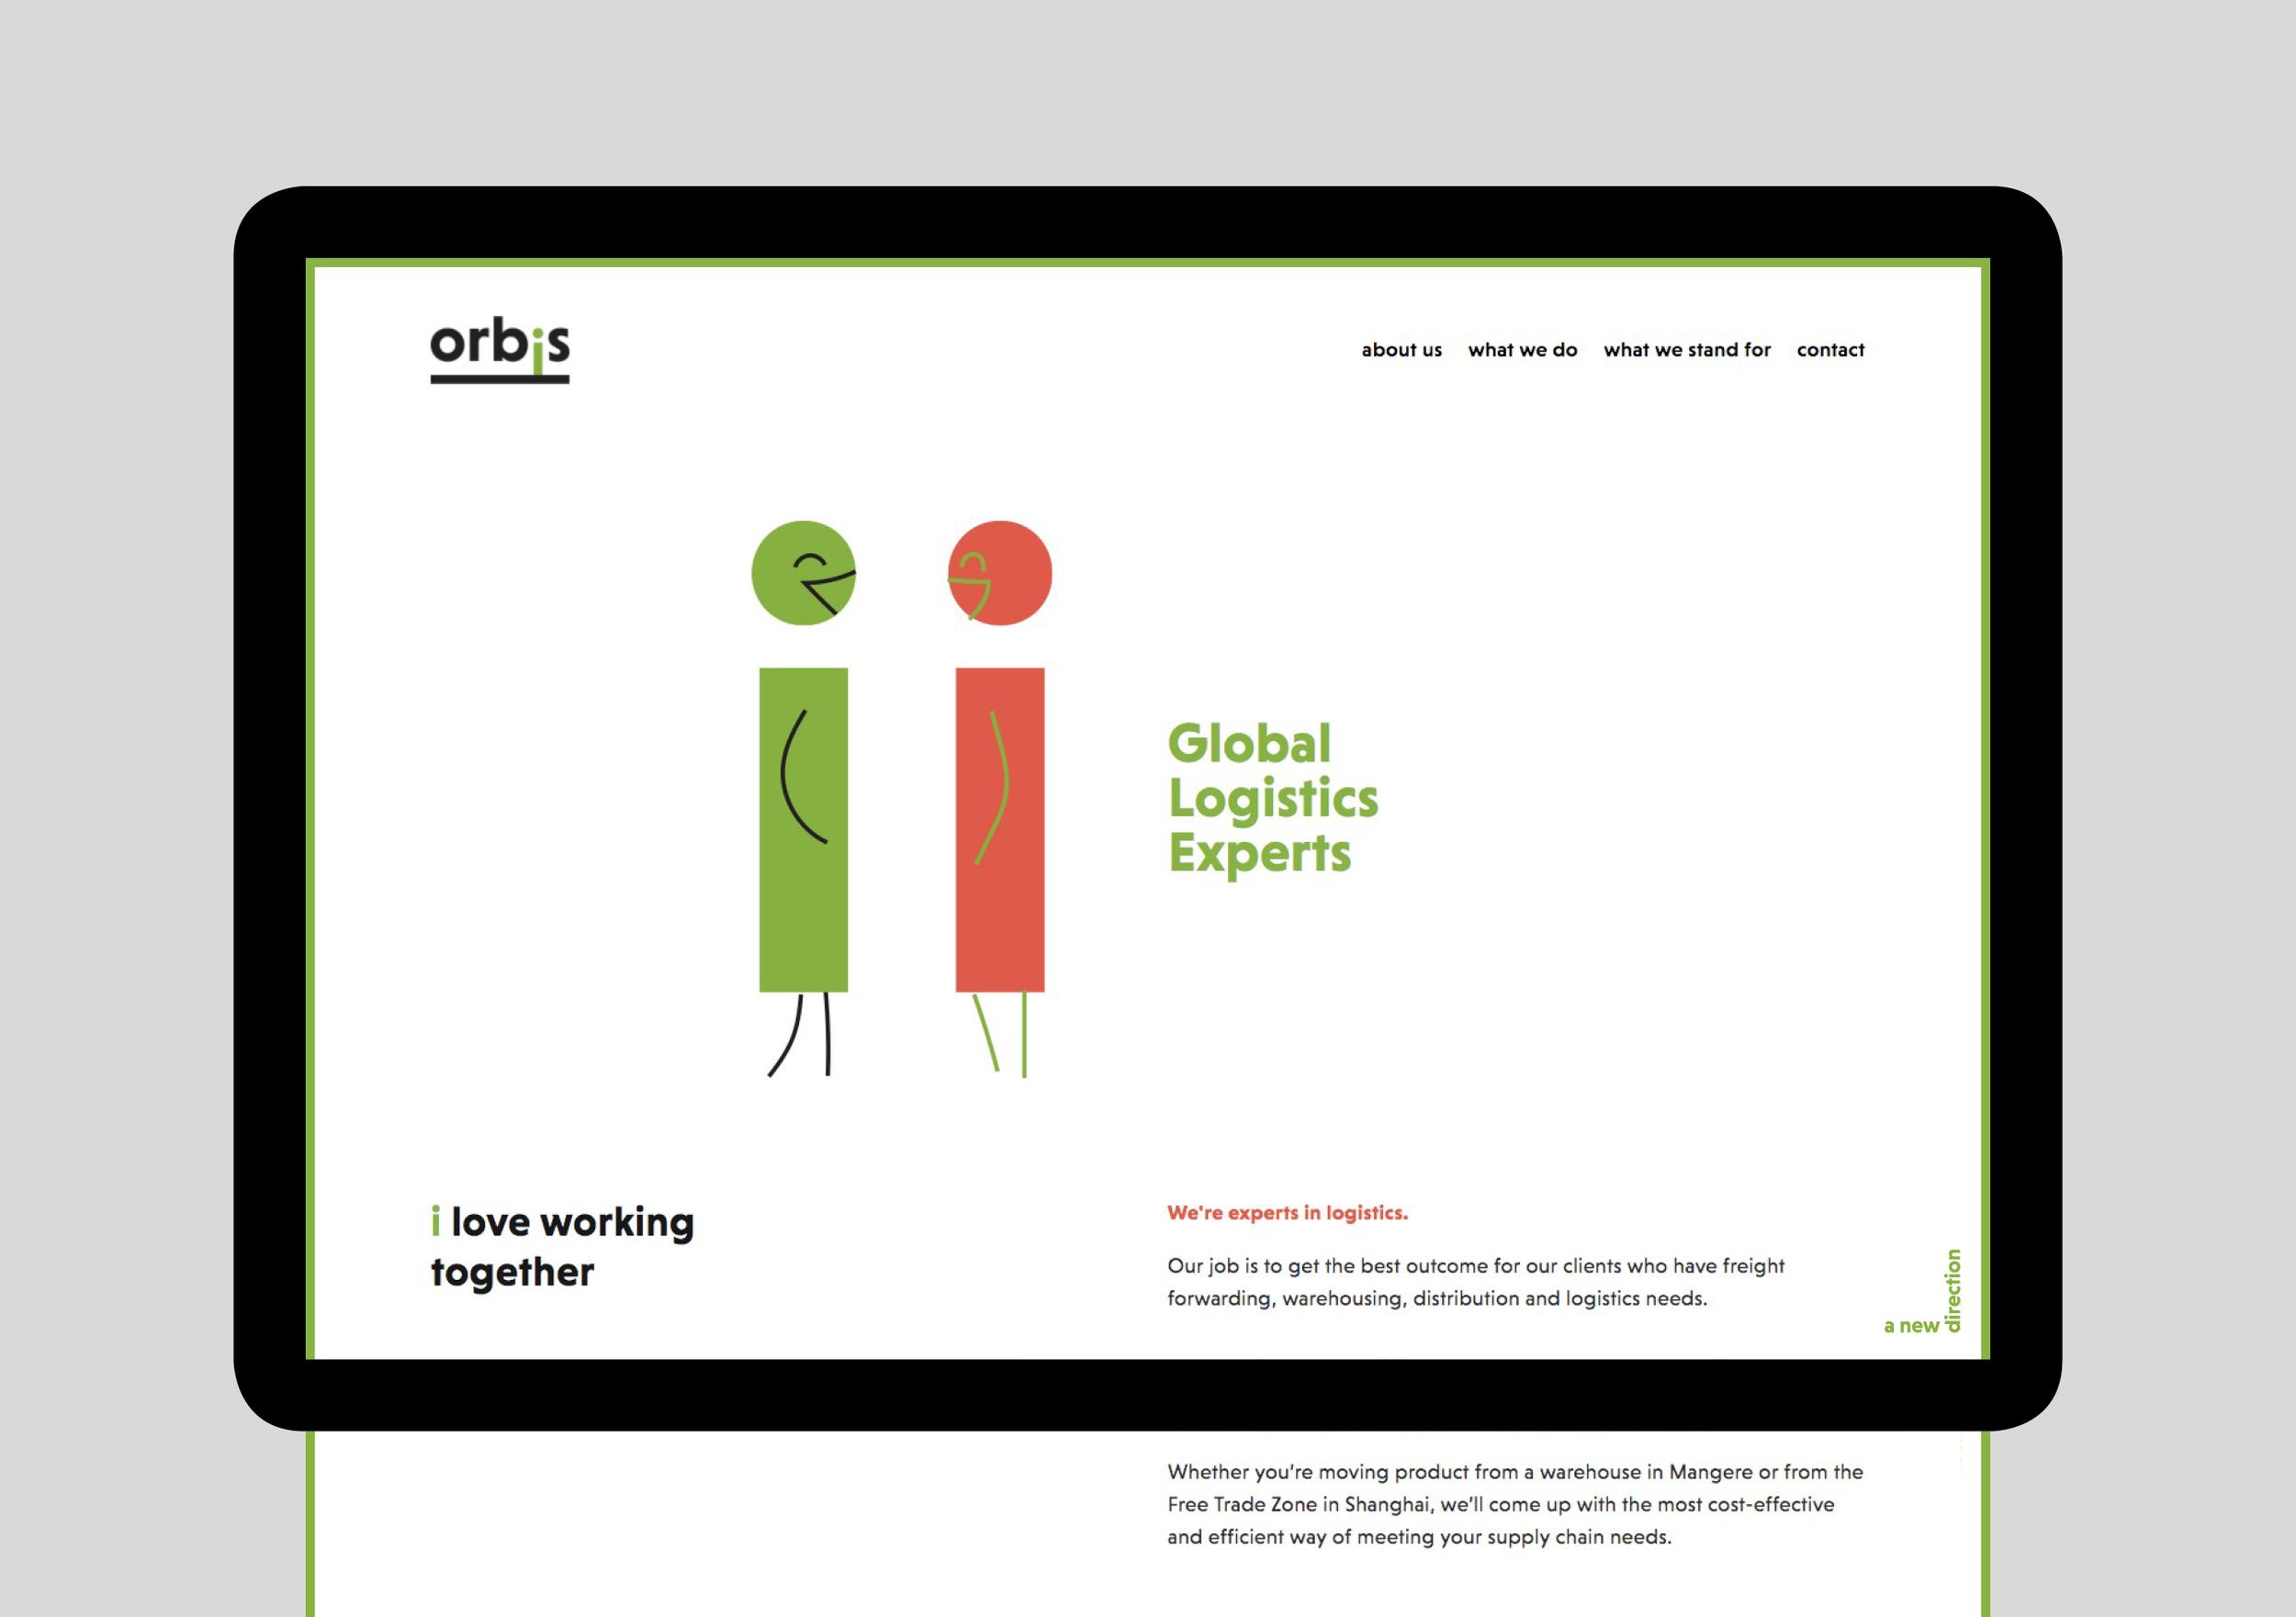 Orbis_Case_Study_016.png